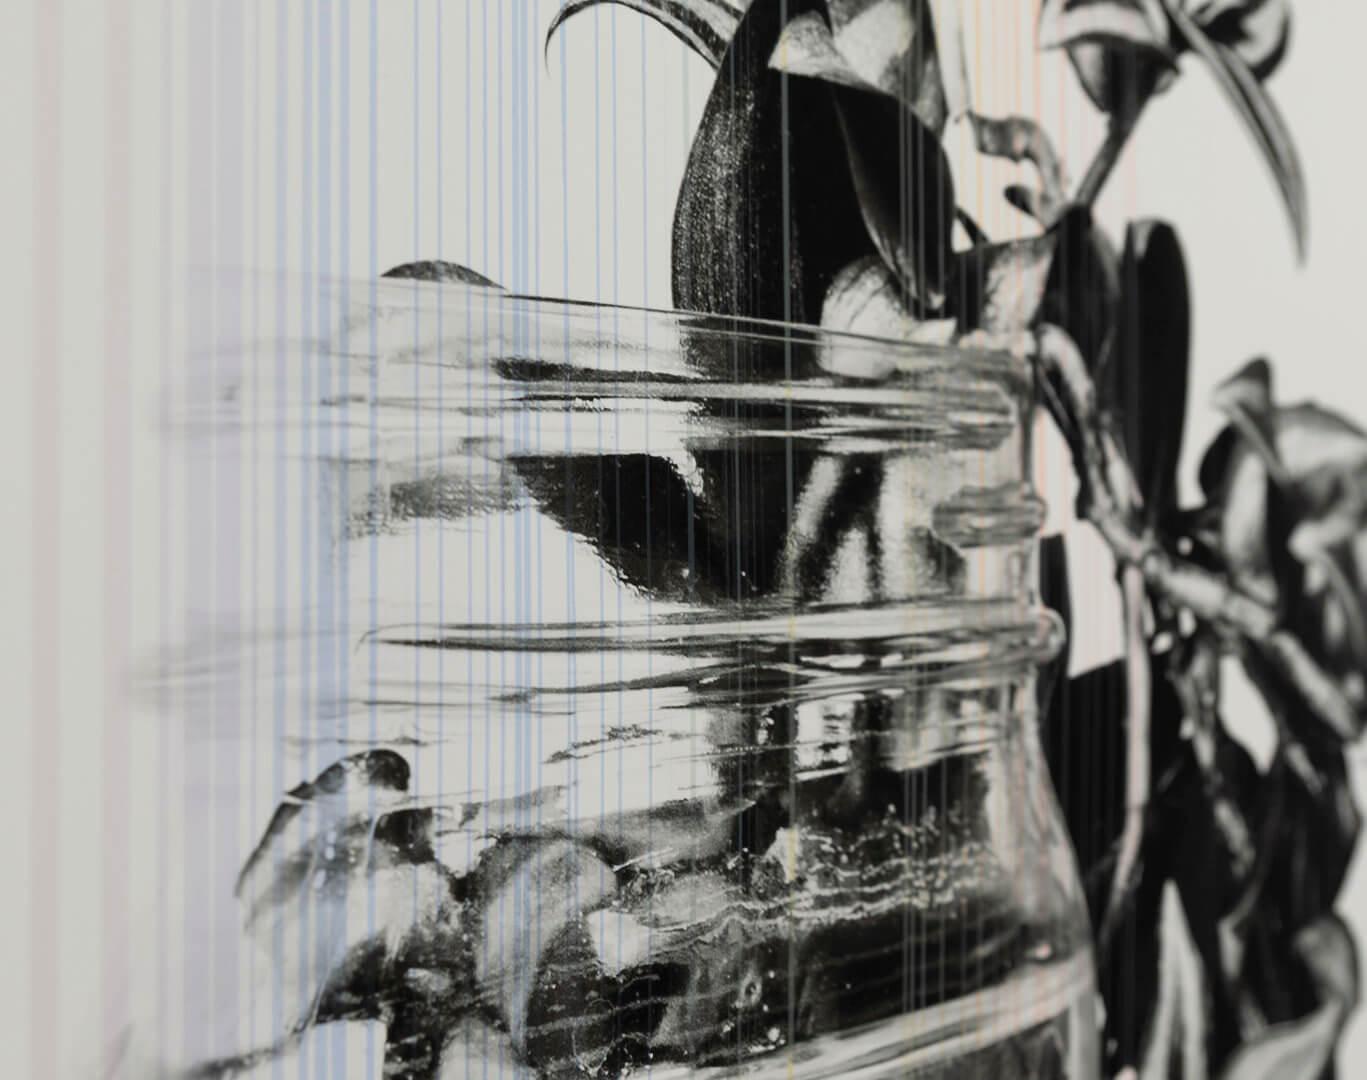 "Detail of Futures Barren Film Stills: I by April Dean. Inkjet and screen print. 36 x 24"". 2019. Image credit: Sarah Fuller."